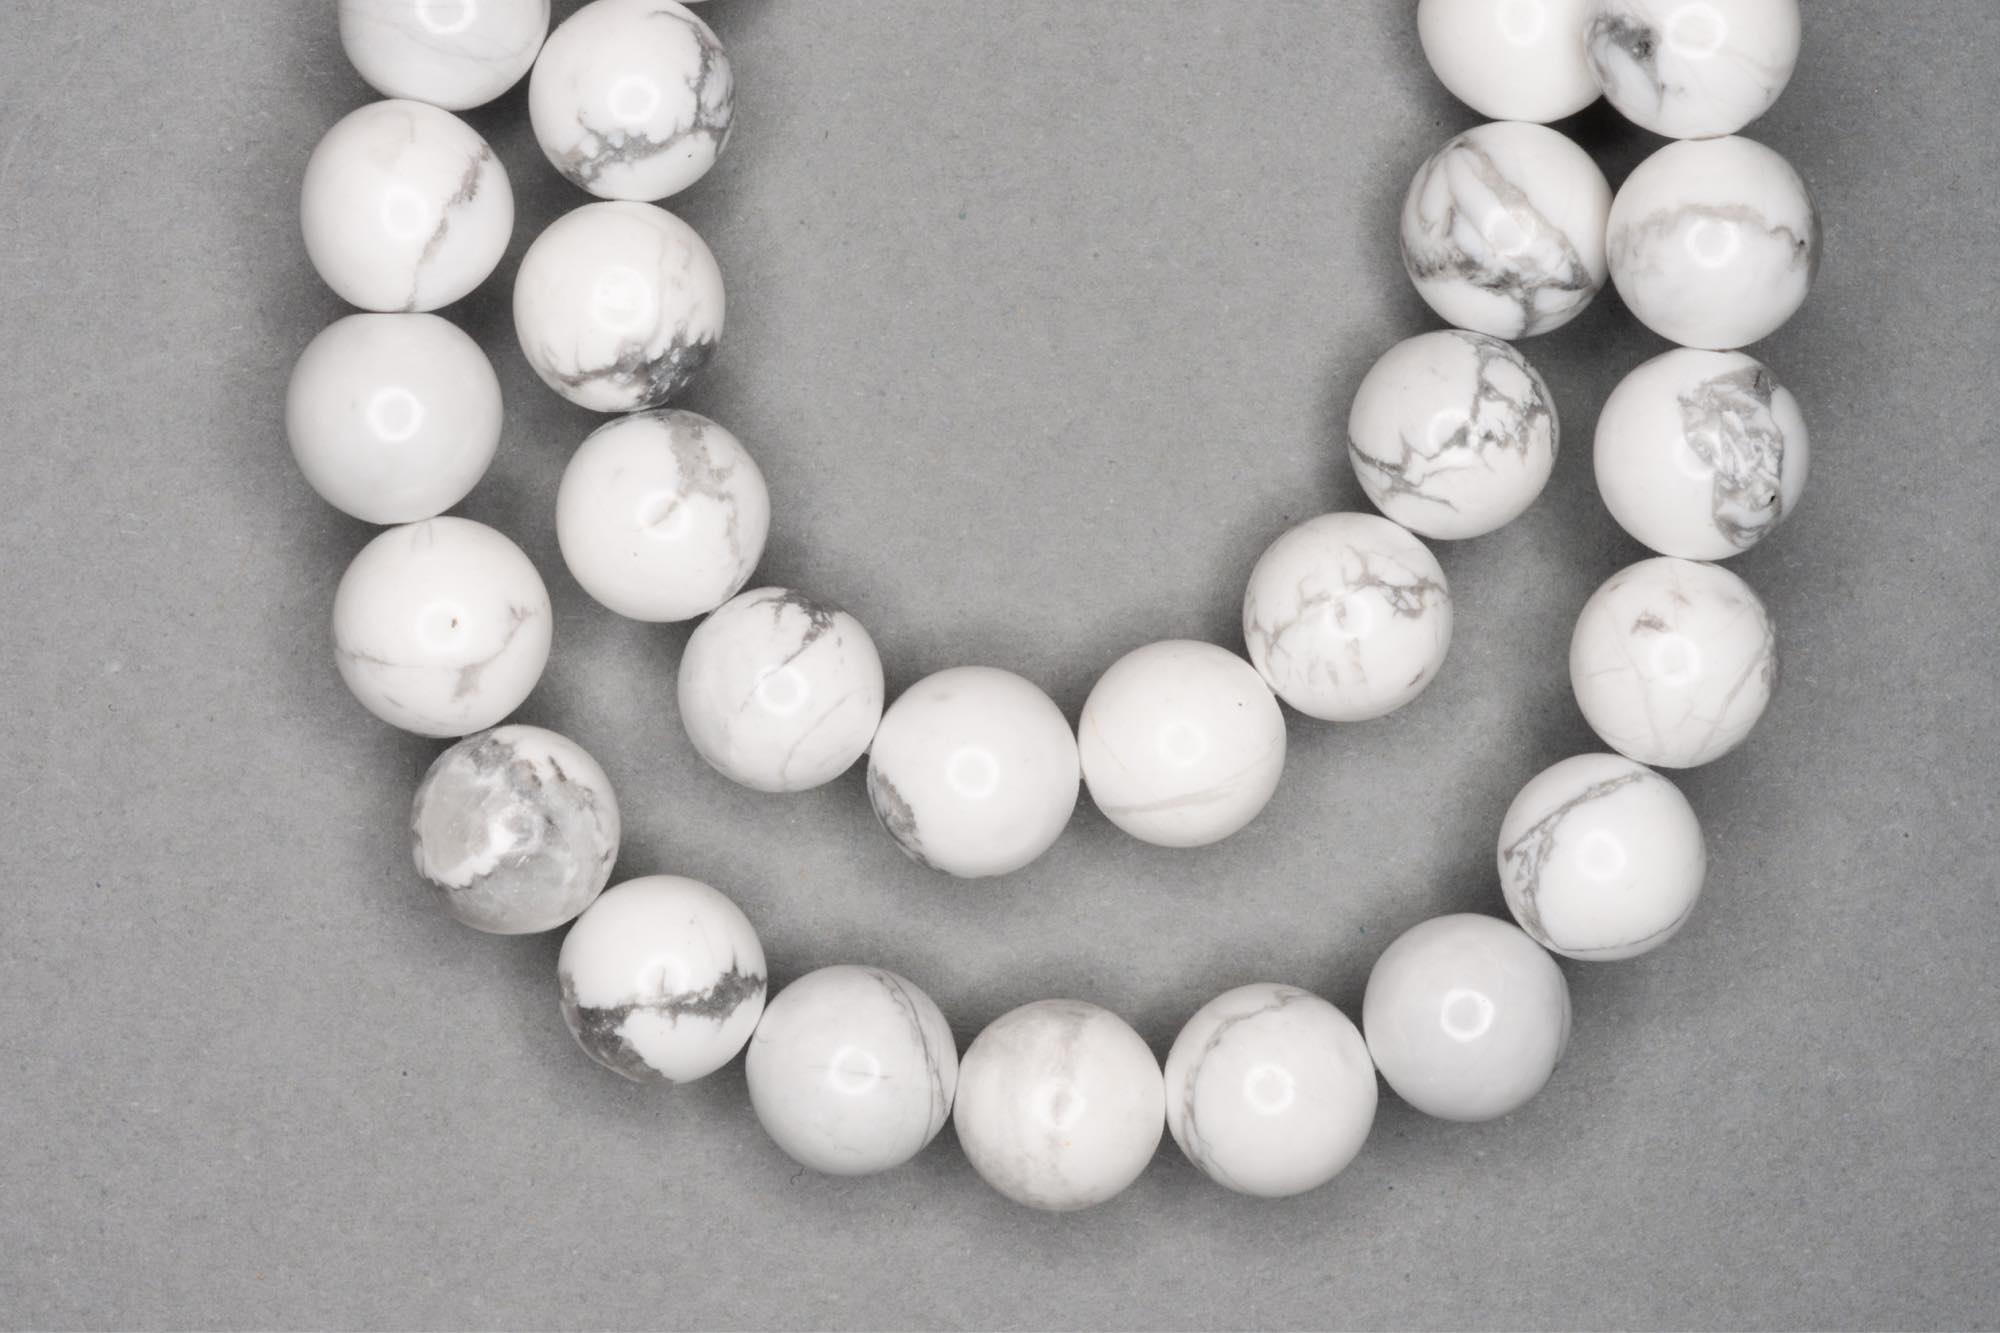 White Chalk Turquoise 38cm Strand, 10mm Round